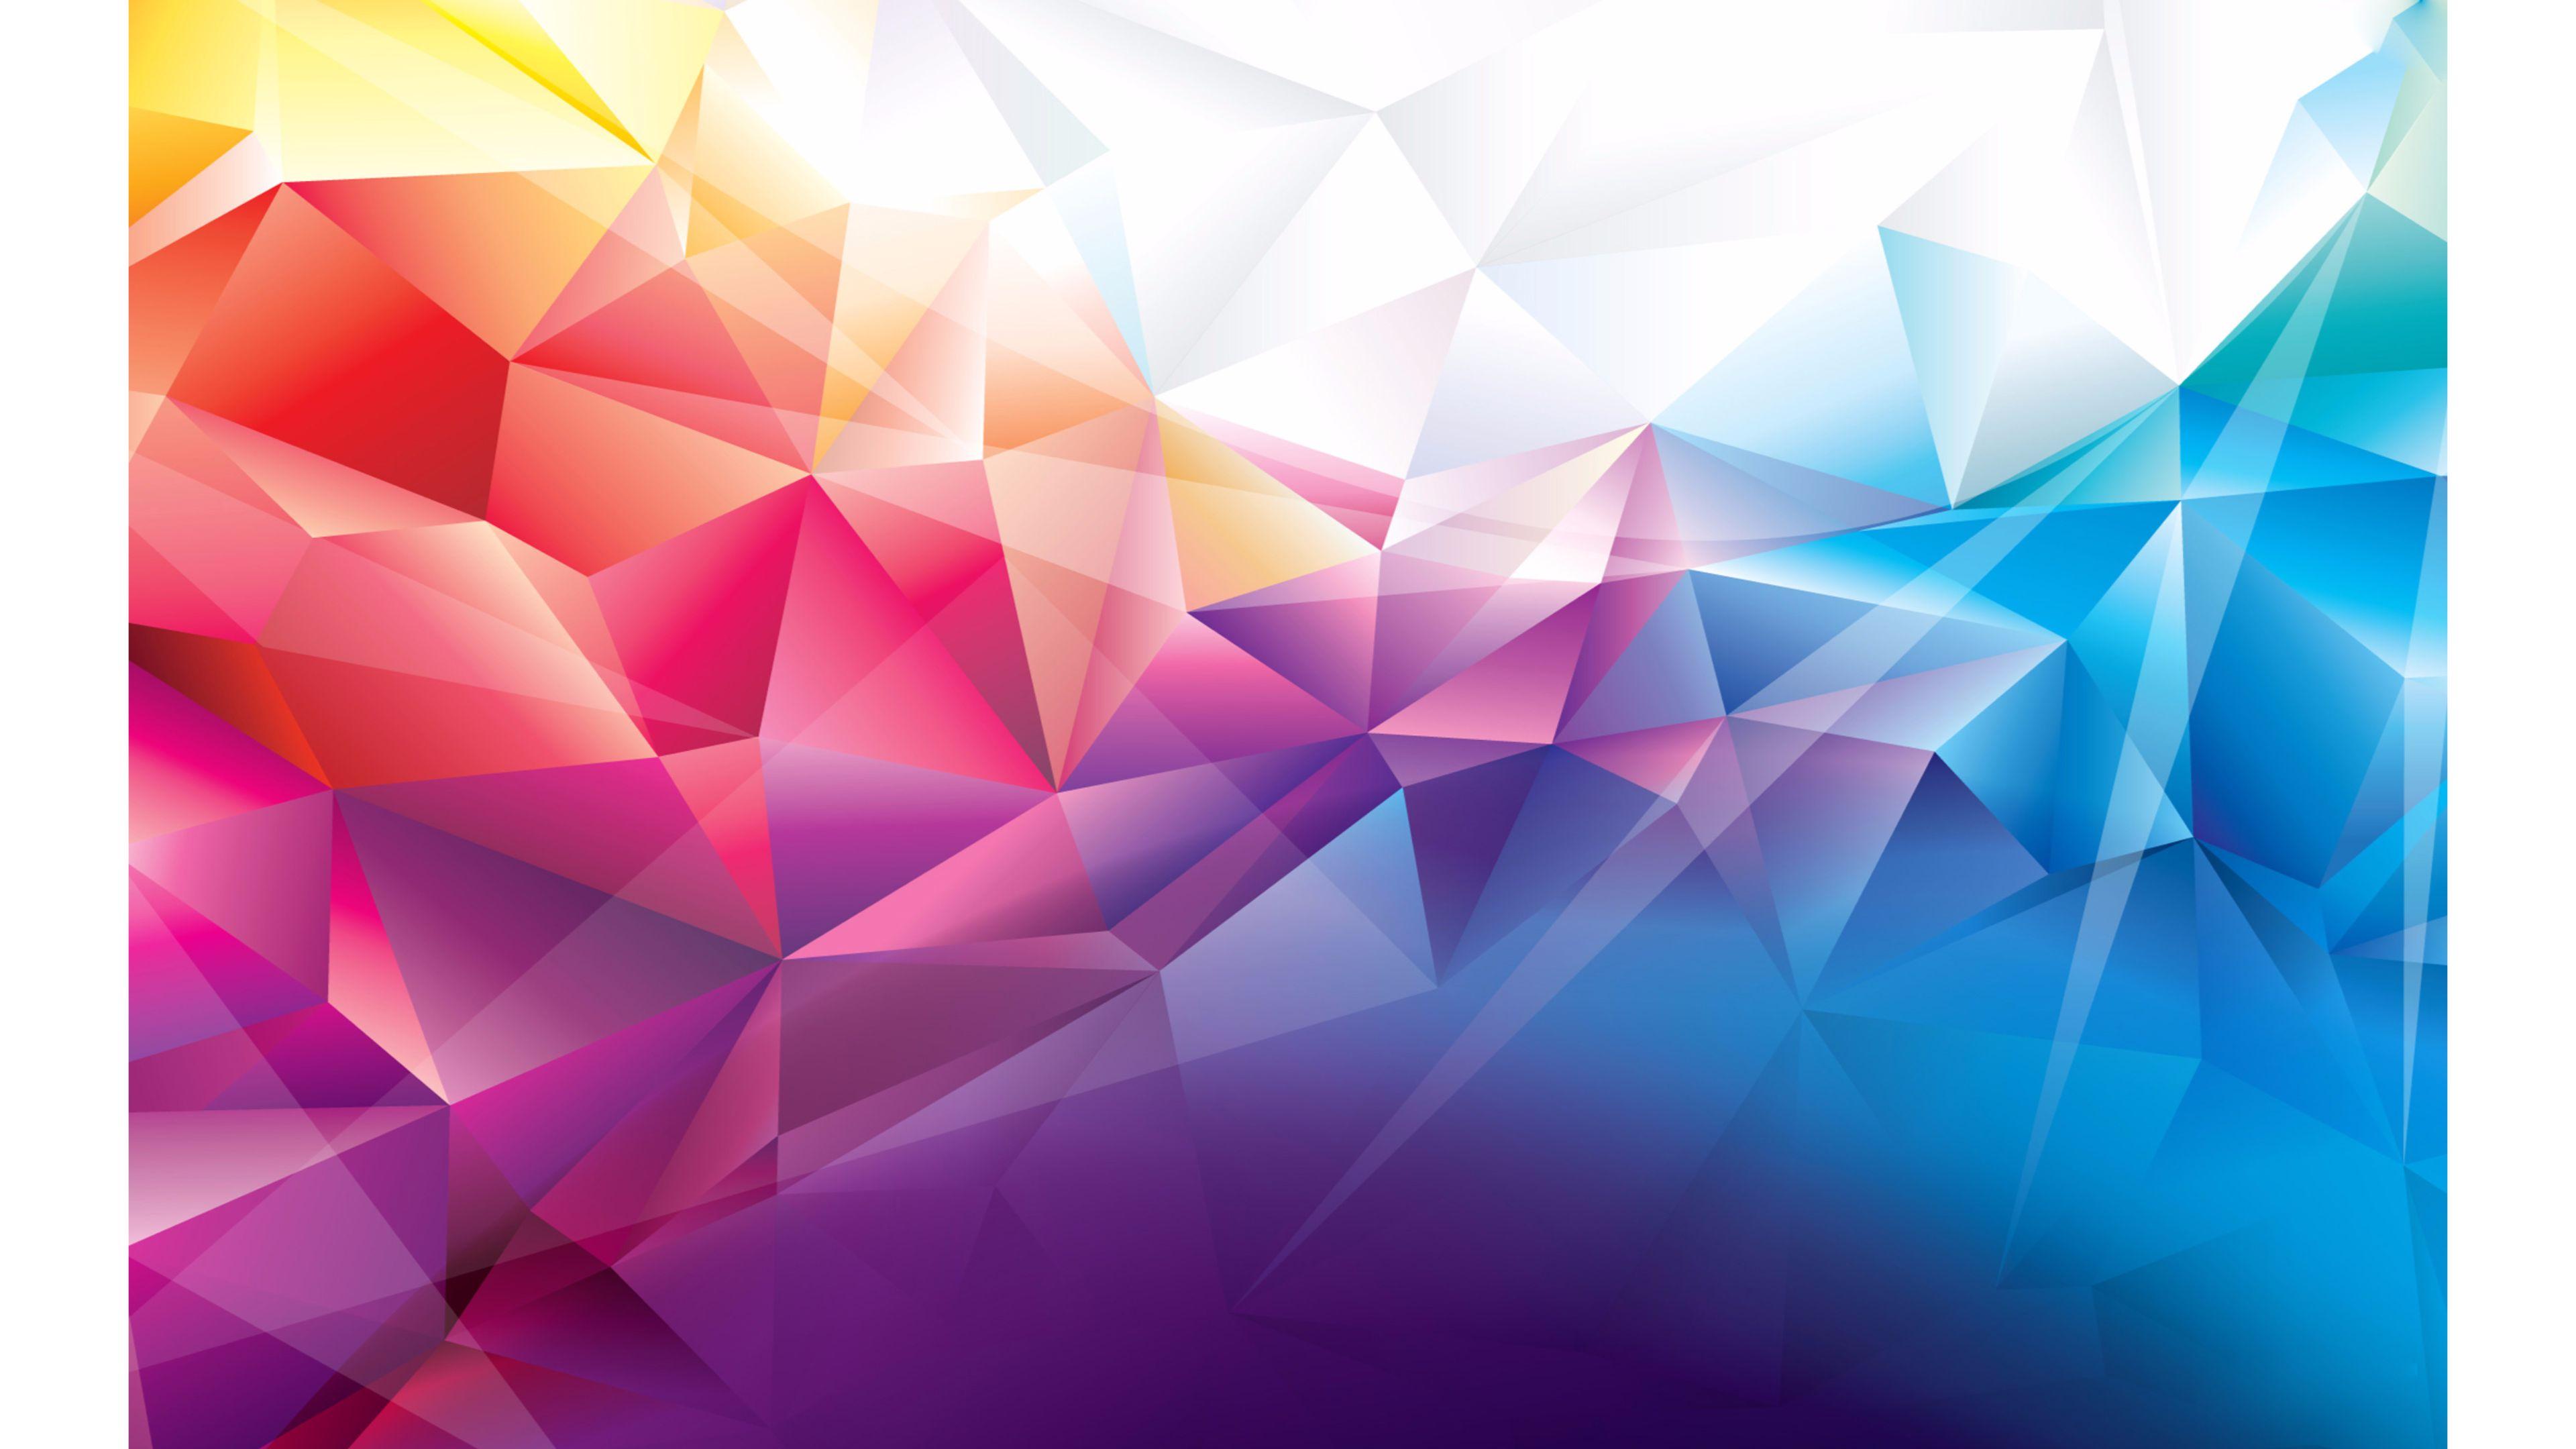 Colors Abstract 4K Wallpaper   Free 4K Wallpaper